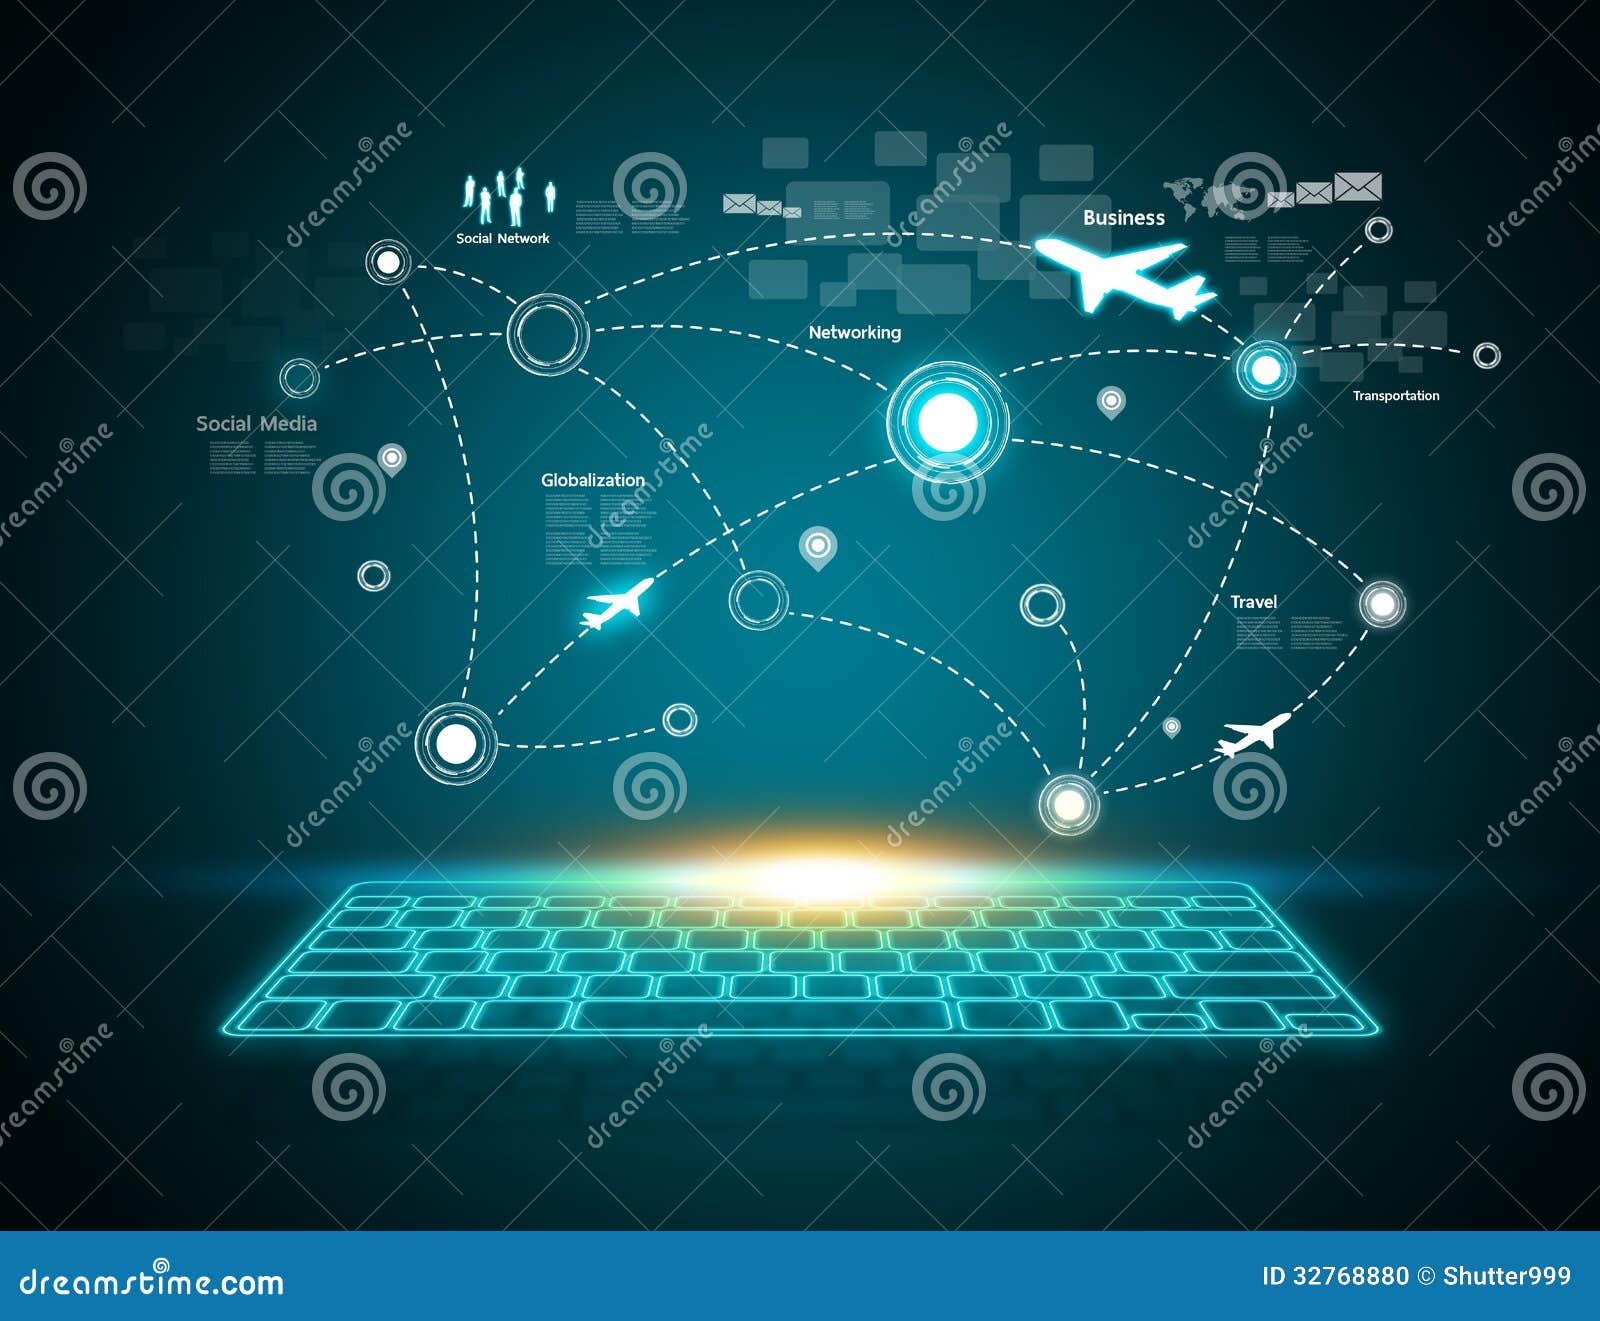 Computers Technology: Computer Keyboard Stock Photo